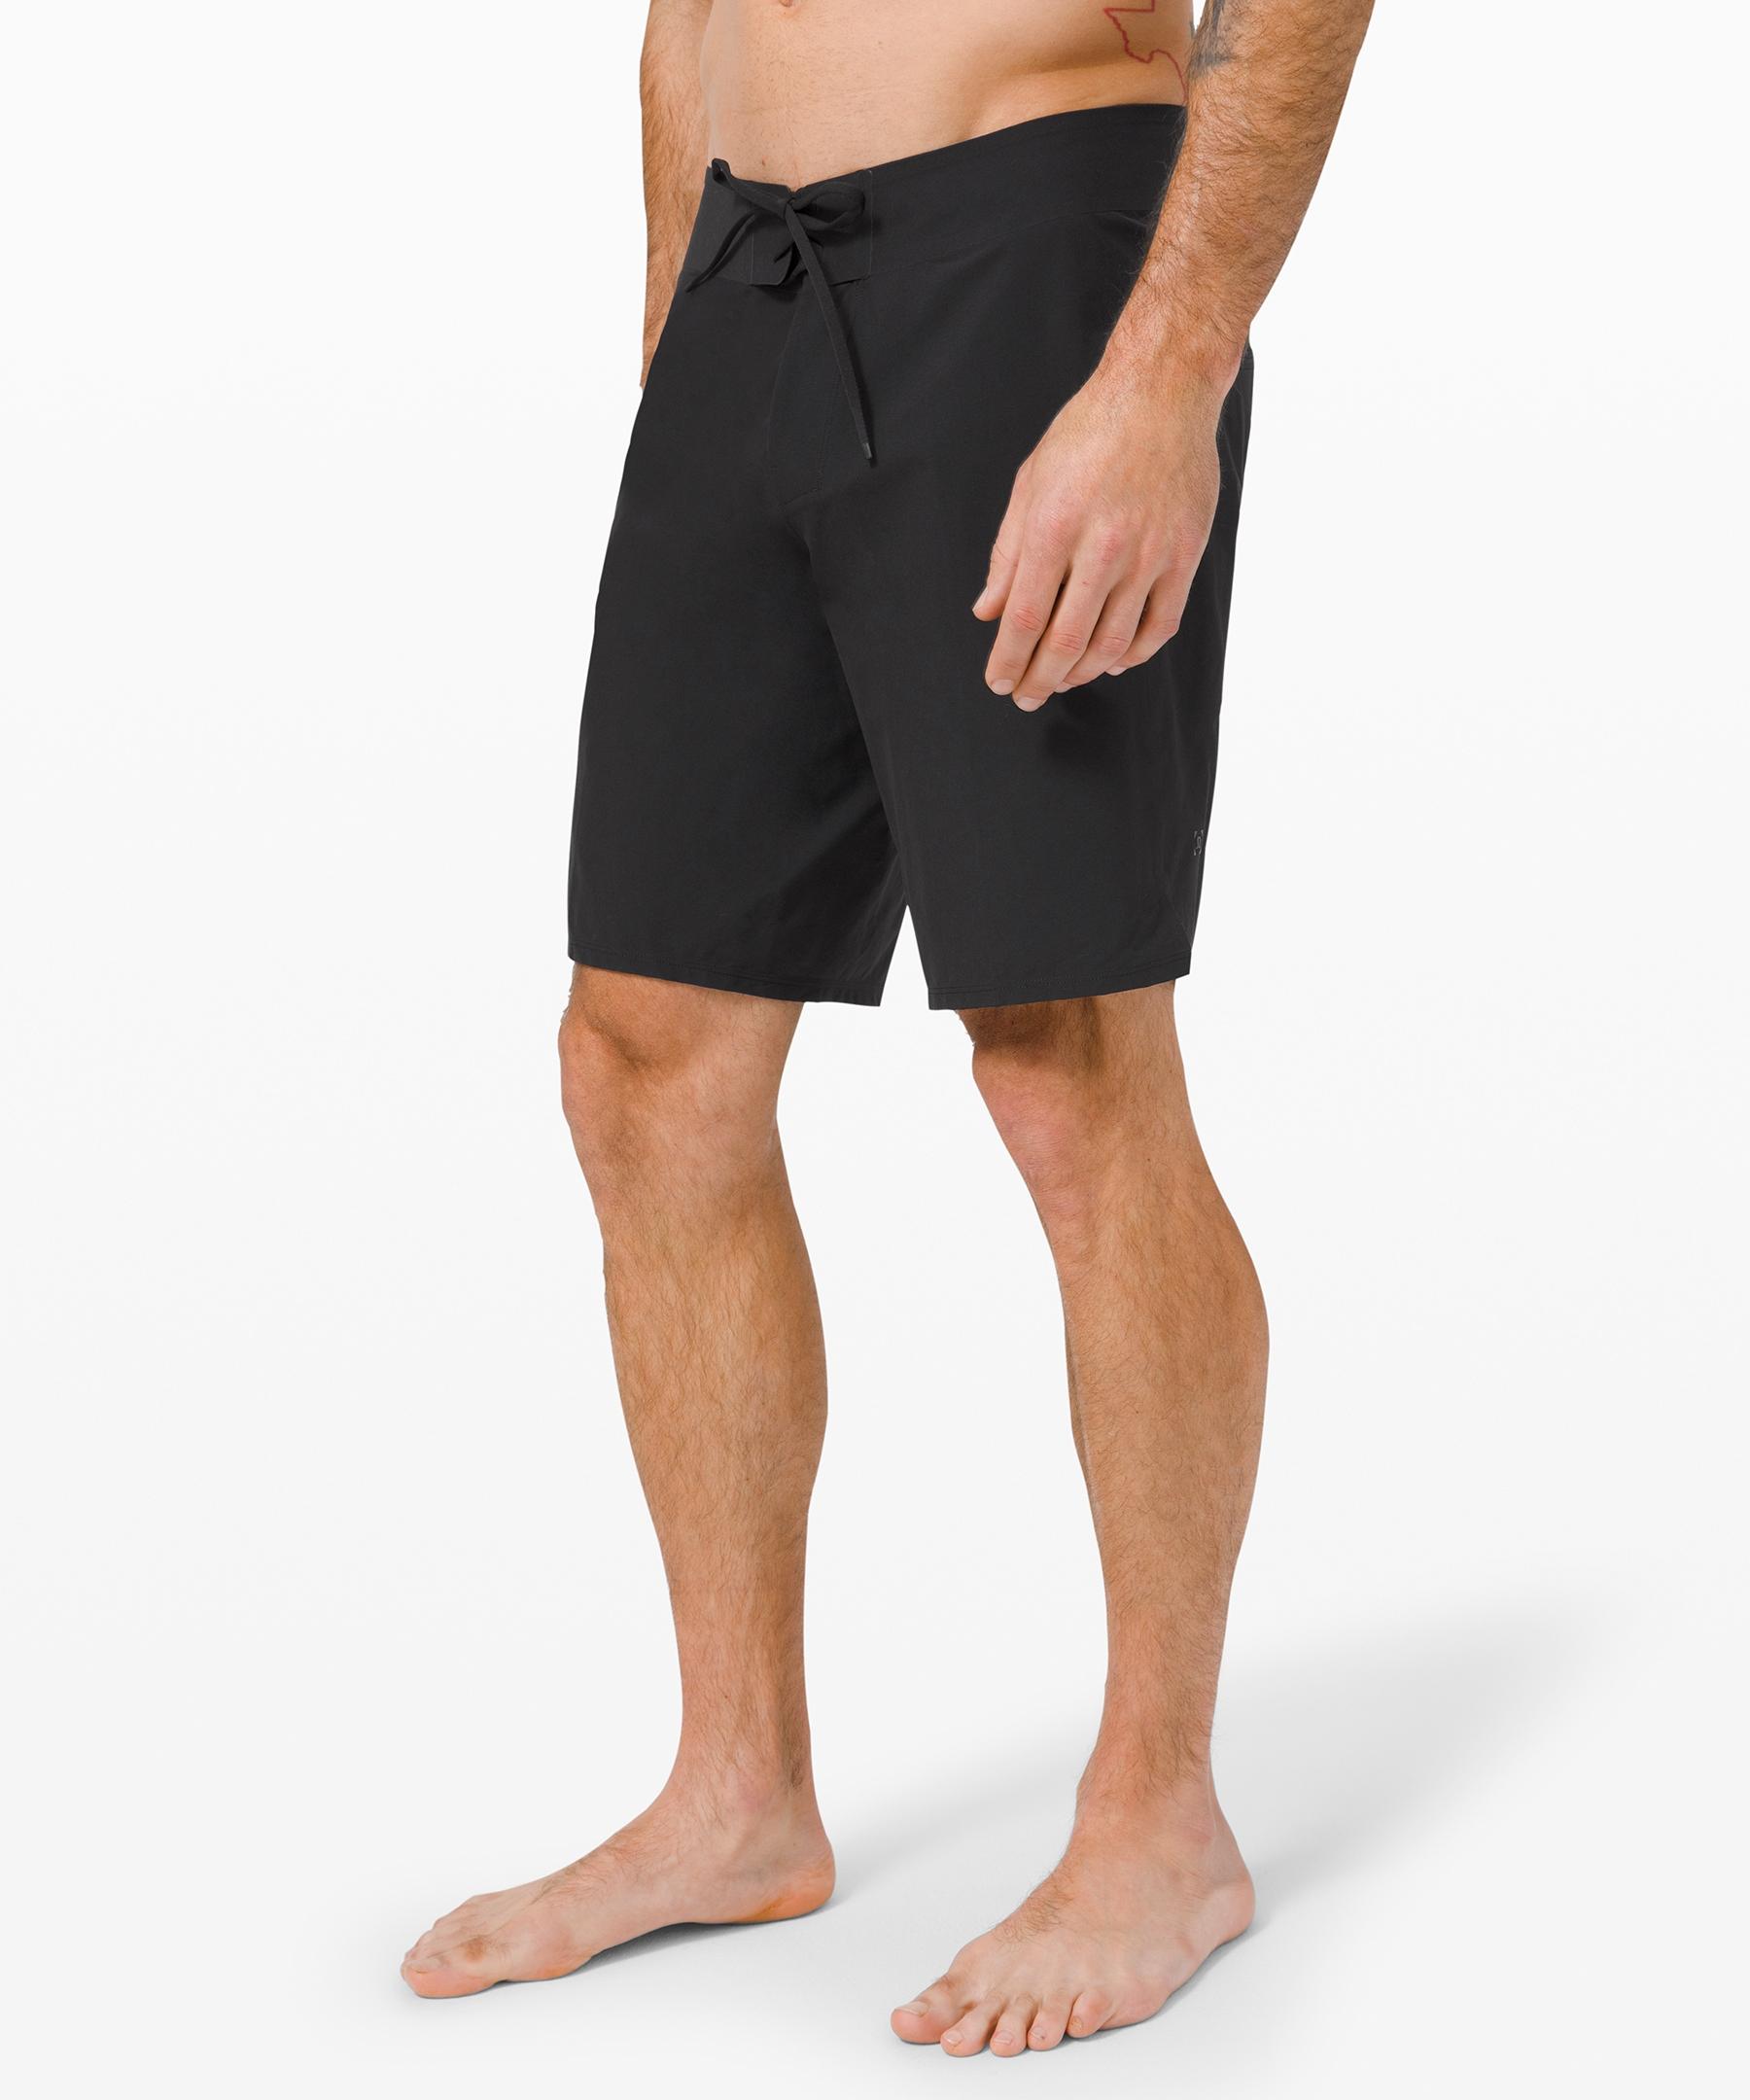 Current State 男士运动短裤 9